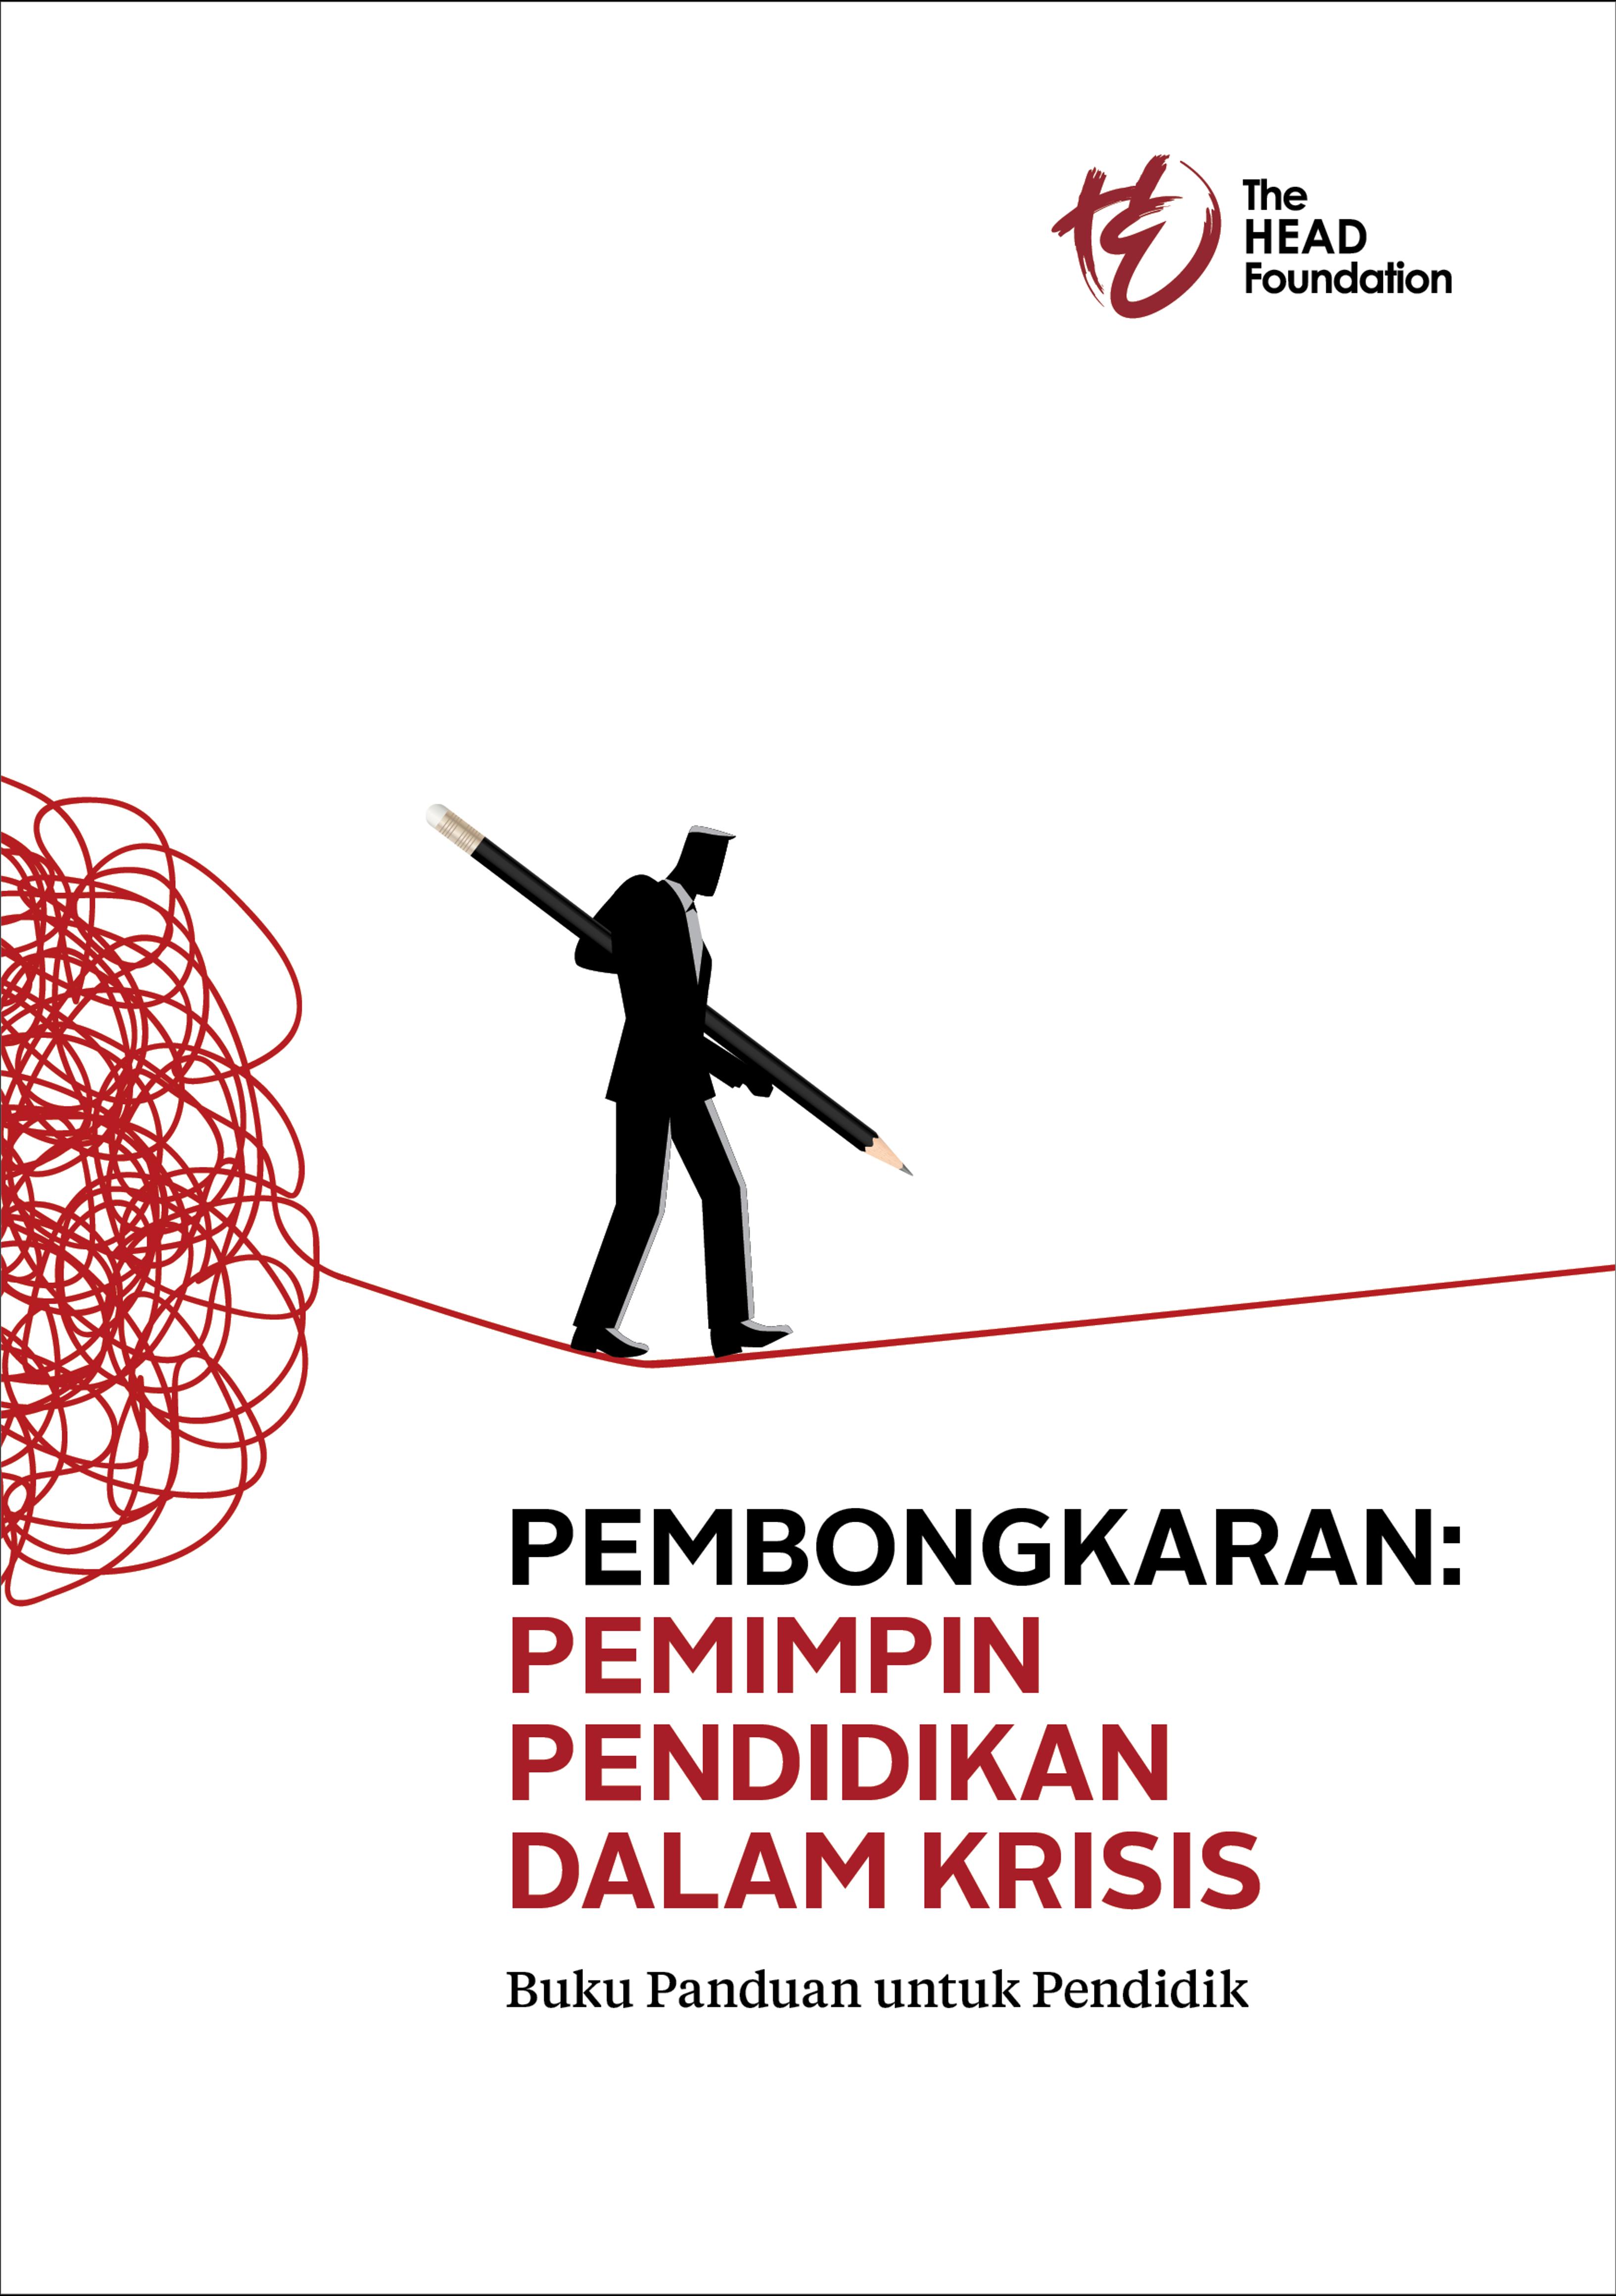 Handbook 1 (Malay) cover_Pembongkaran Para Pemimpin Pendidikan Dalam Krisis (website)